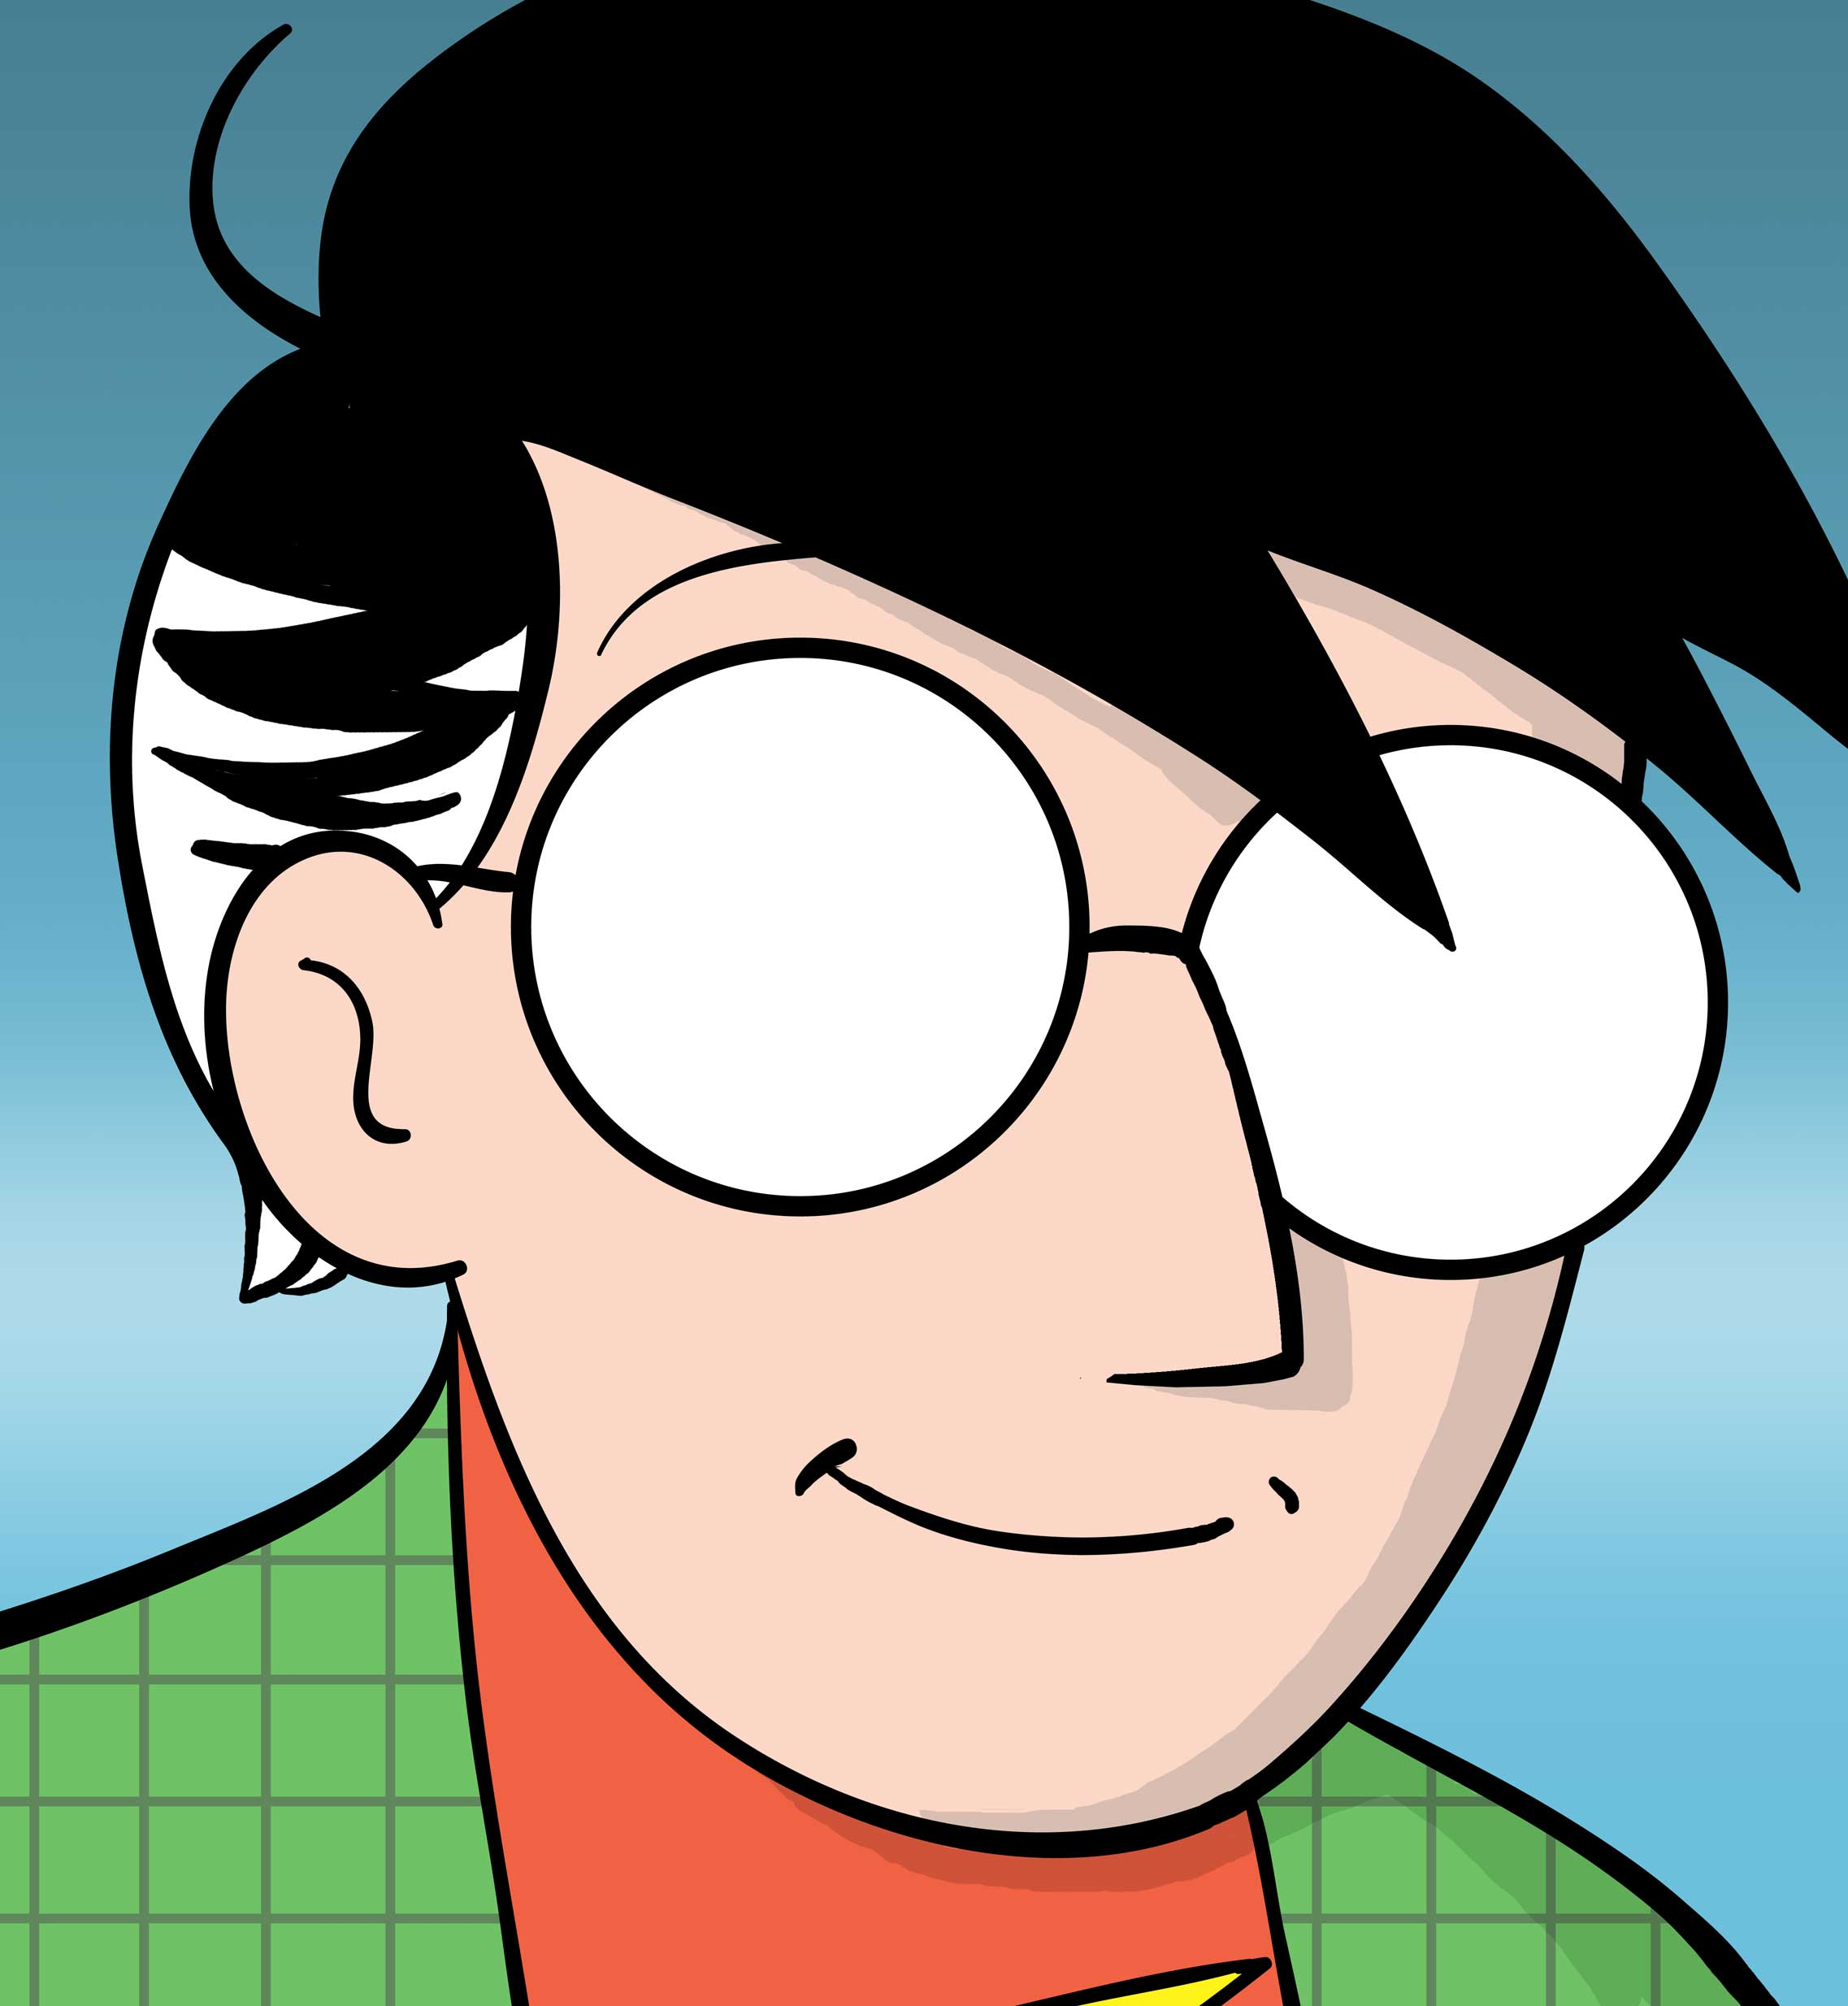 Scott-McCloud-author-cartoon1.jpg